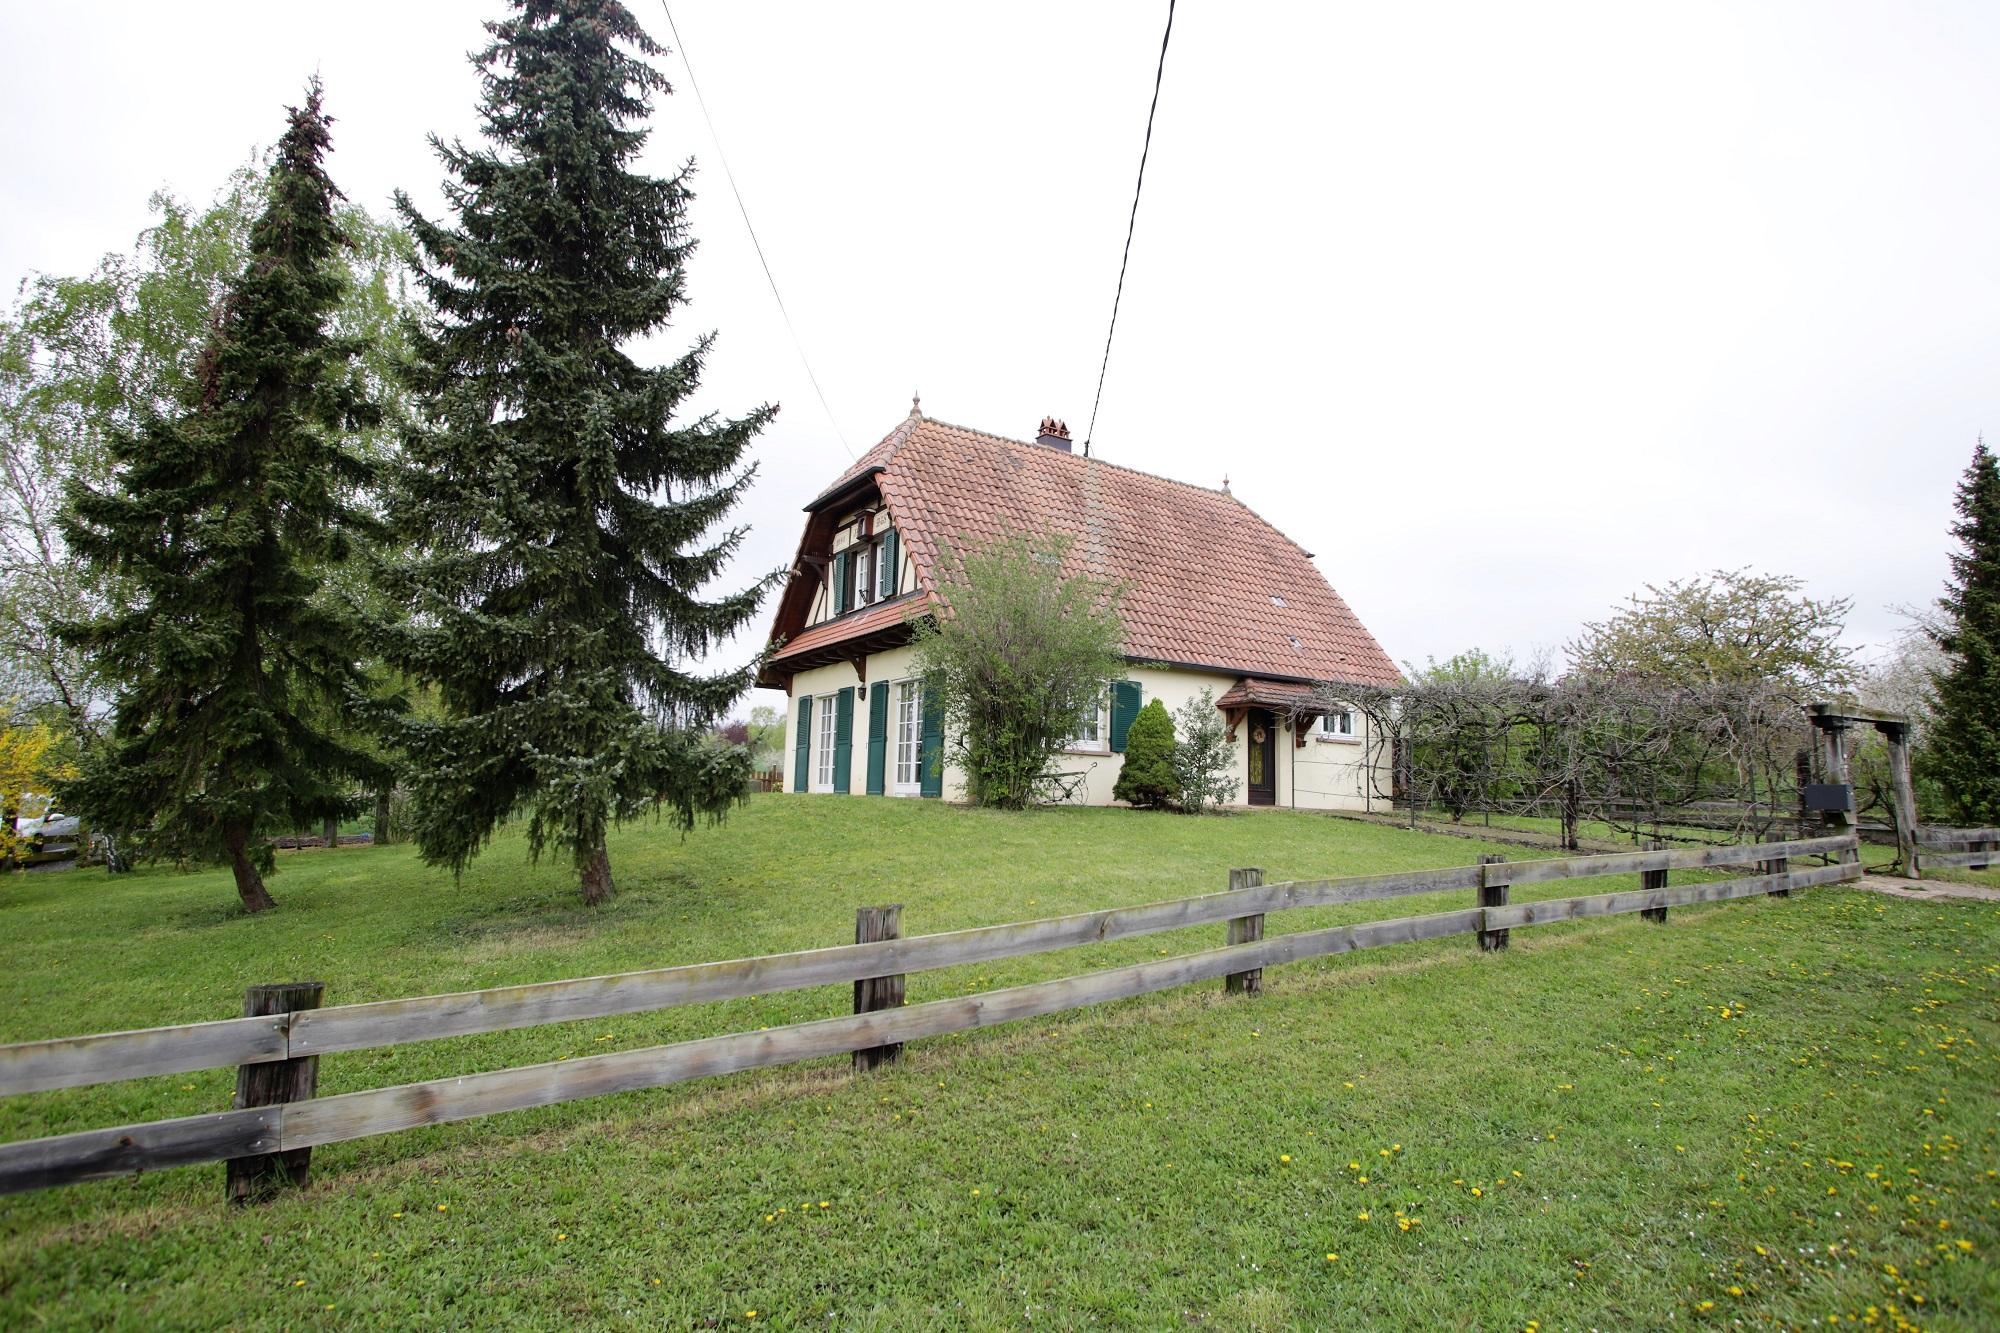 Meublé de tourisme Saint Ulrich (Avenheim)